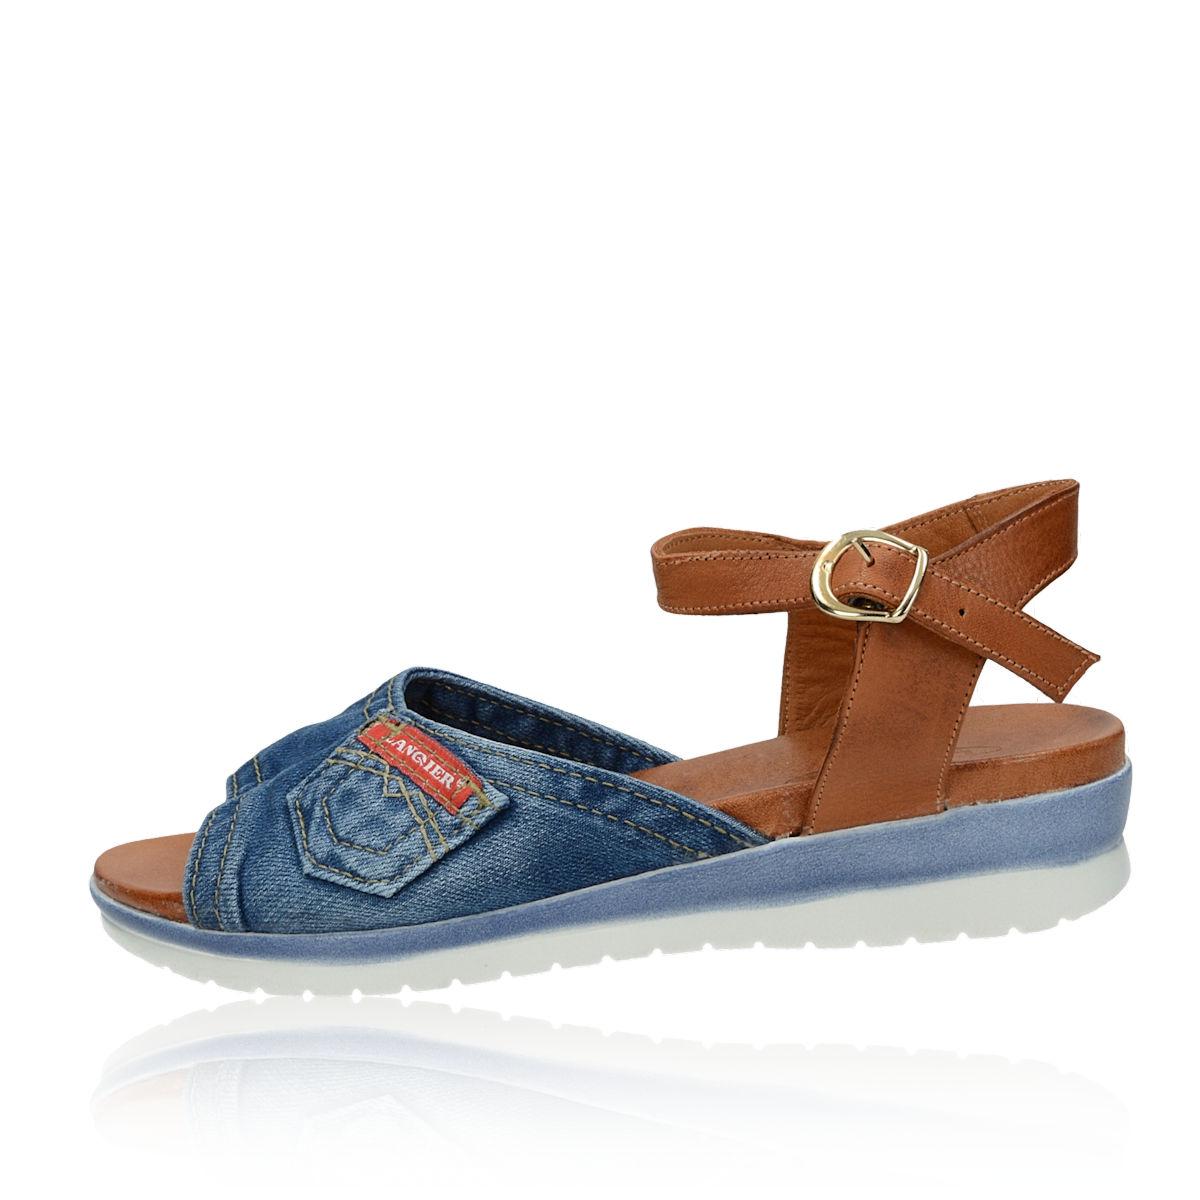 b2f90272e2be ... Lanqier dámske štýlové sandále s remienkom - modré ...